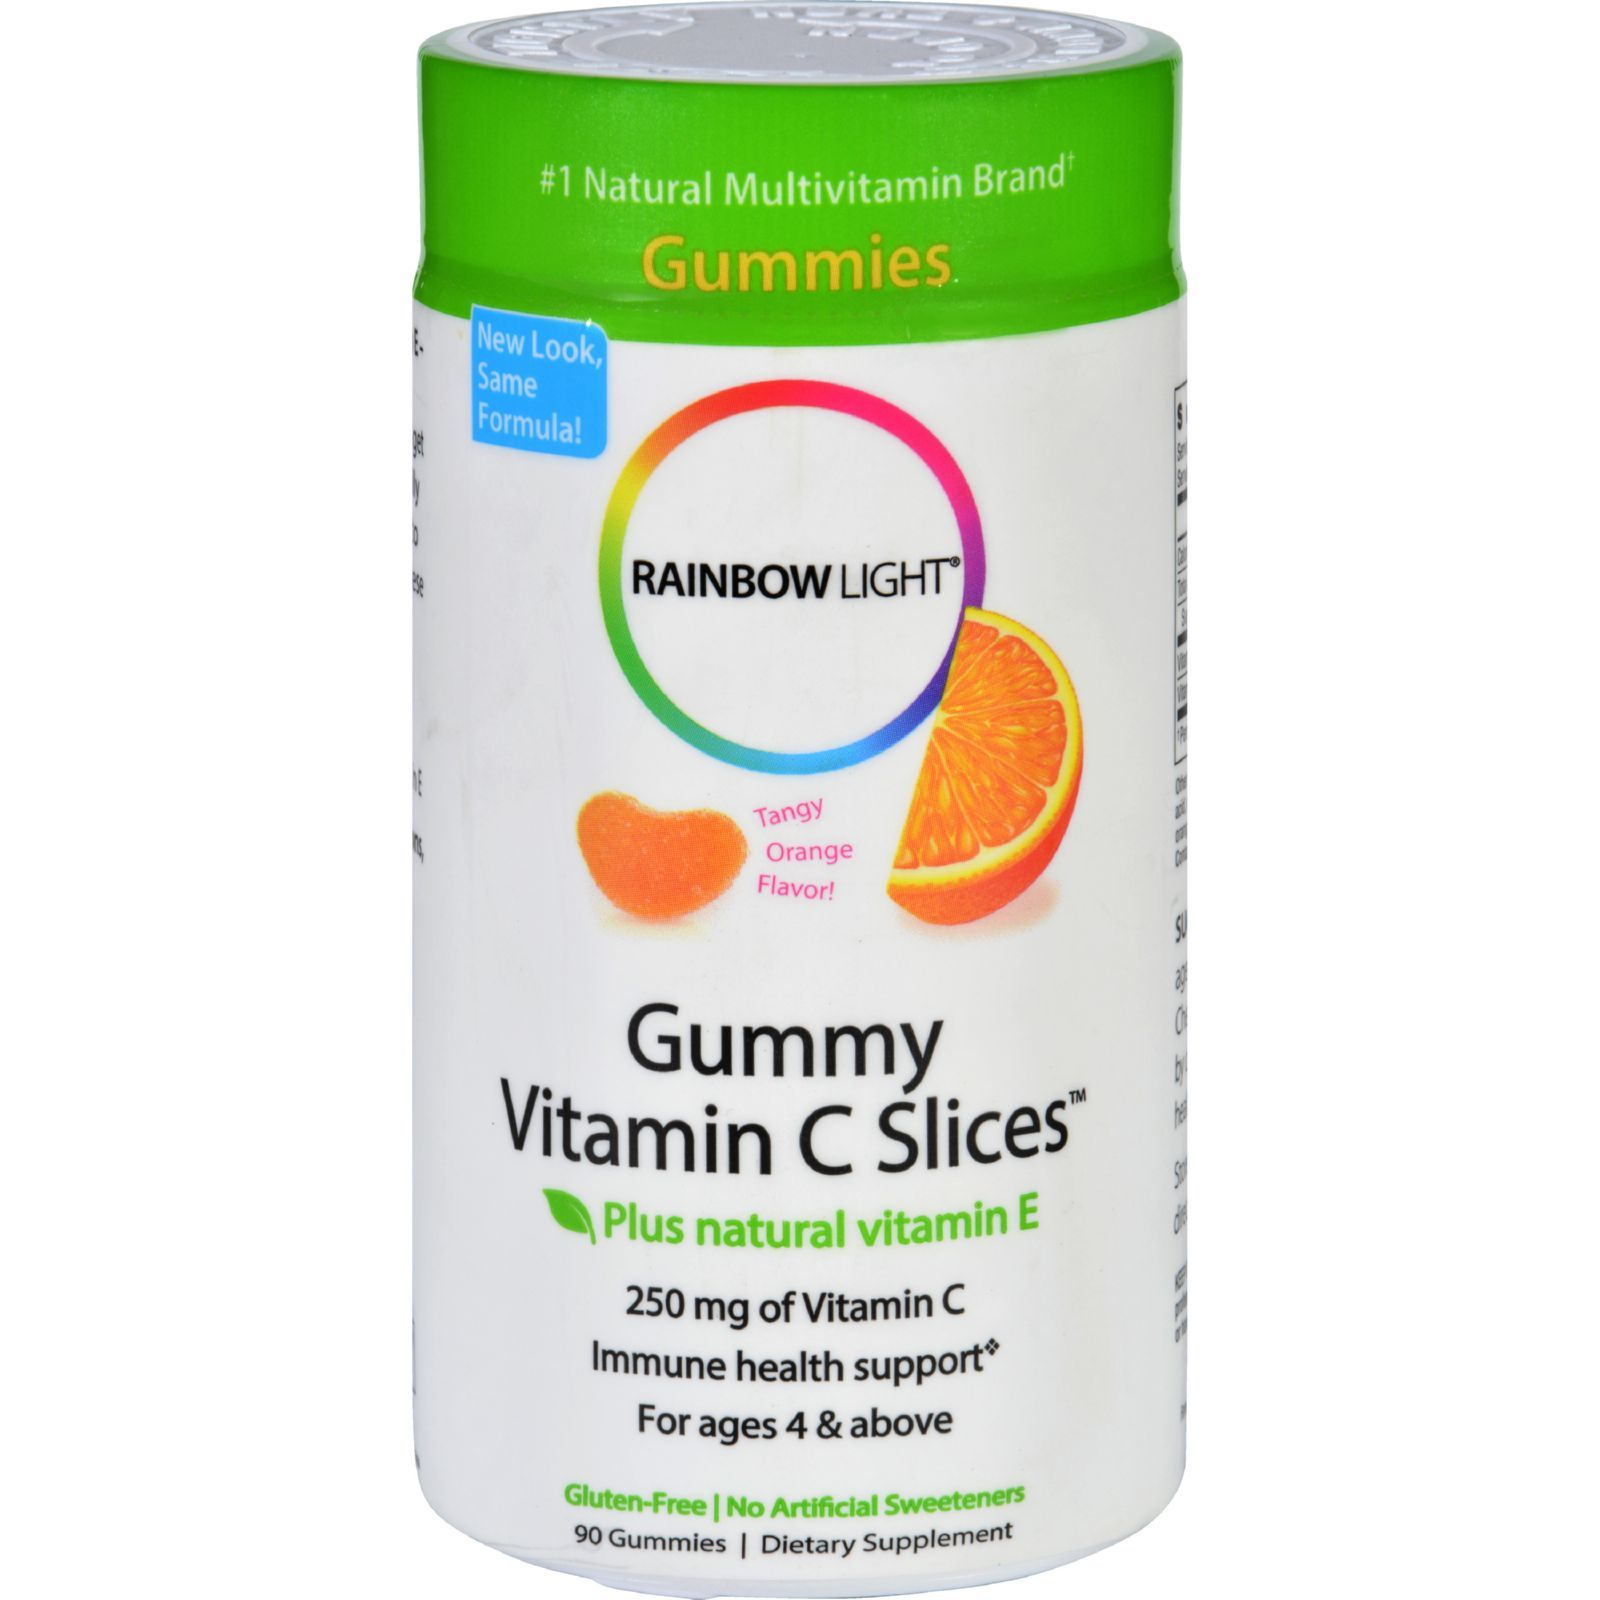 Rainbow Light Gummy Vitamin C Slices Tangy Orange - 250 mg - 90 Gummies Slices